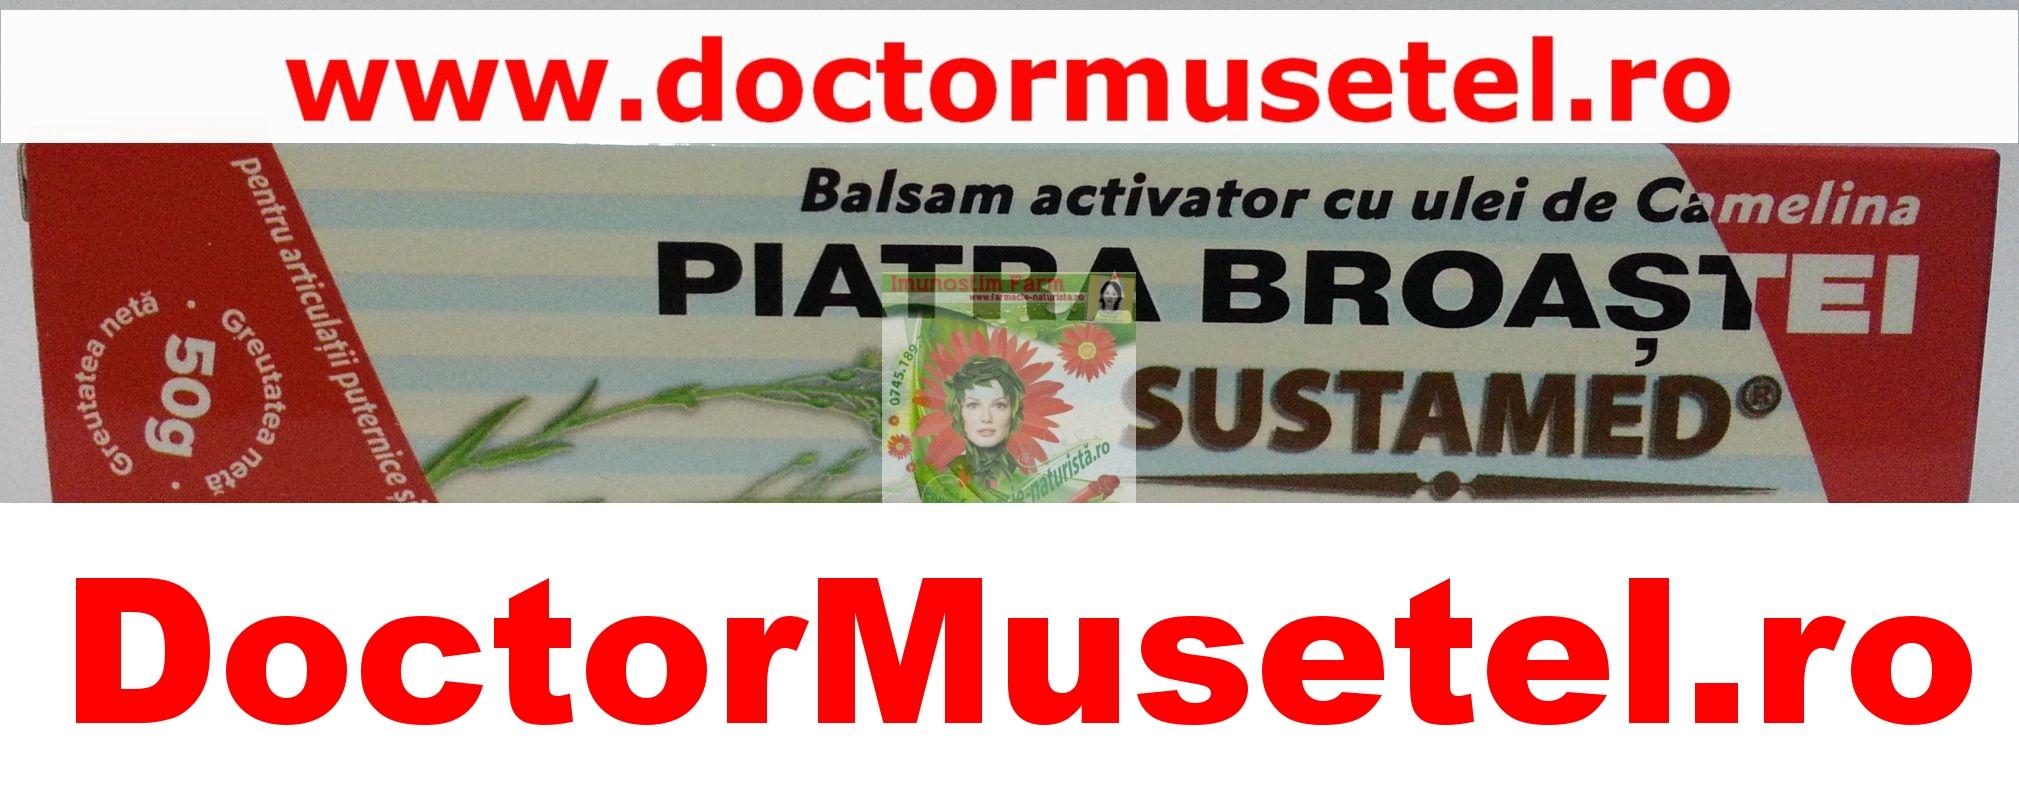 piatra-broastei-sustamed-articulatii-muschi-www-farmacie-naturista-ro.jpg